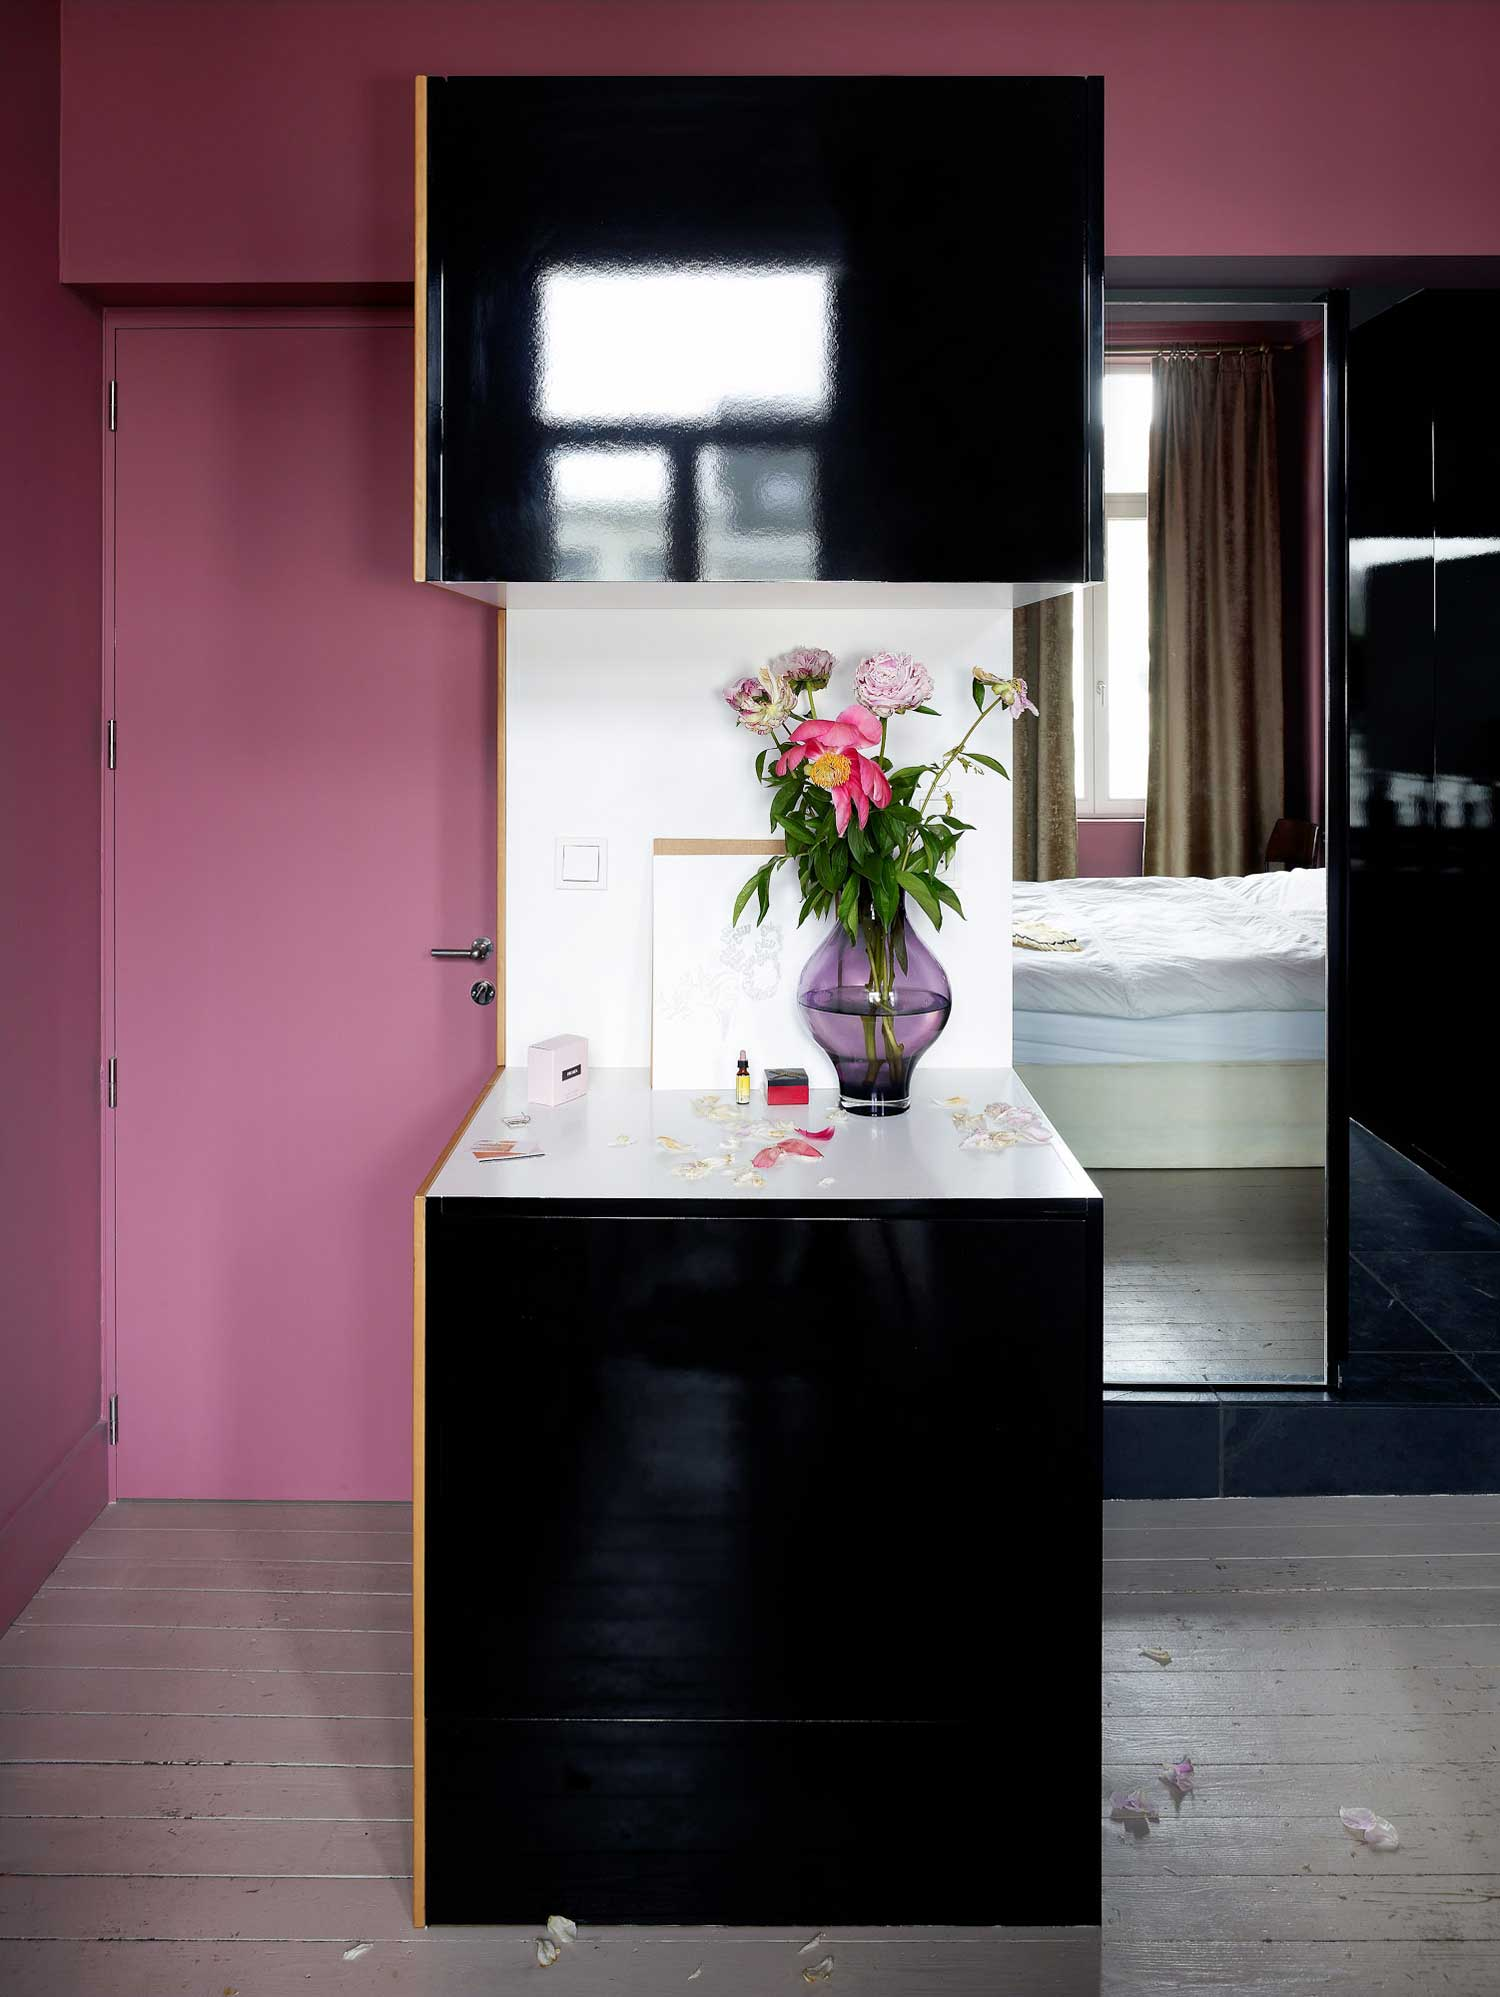 Apartment Anouk Lepere Frederik Vercruysse | Yellowtrace